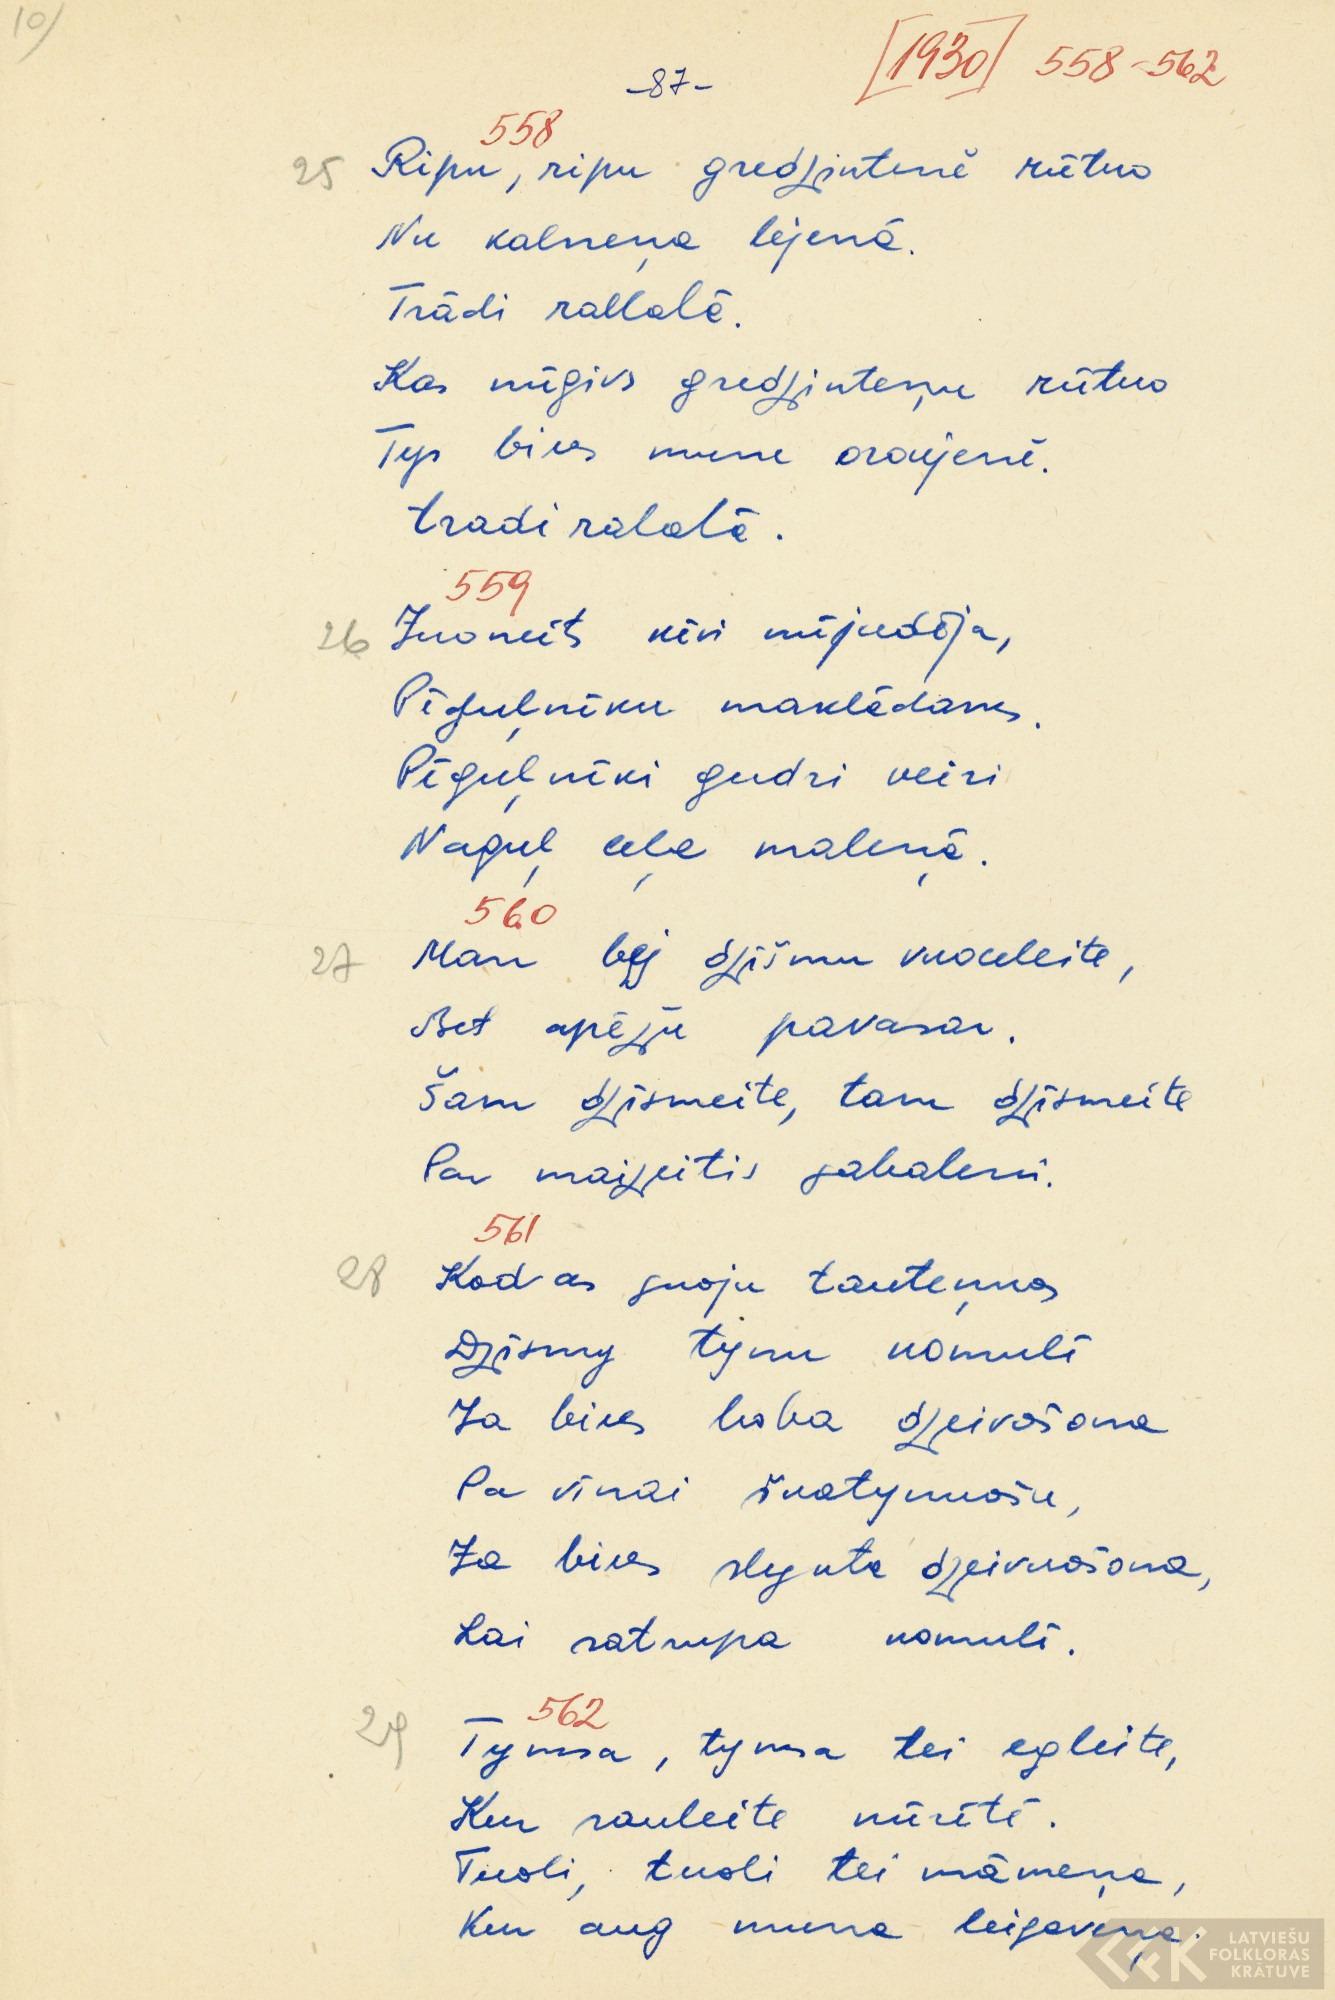 1930-10-zinatniska-ekspedicija-02-0090